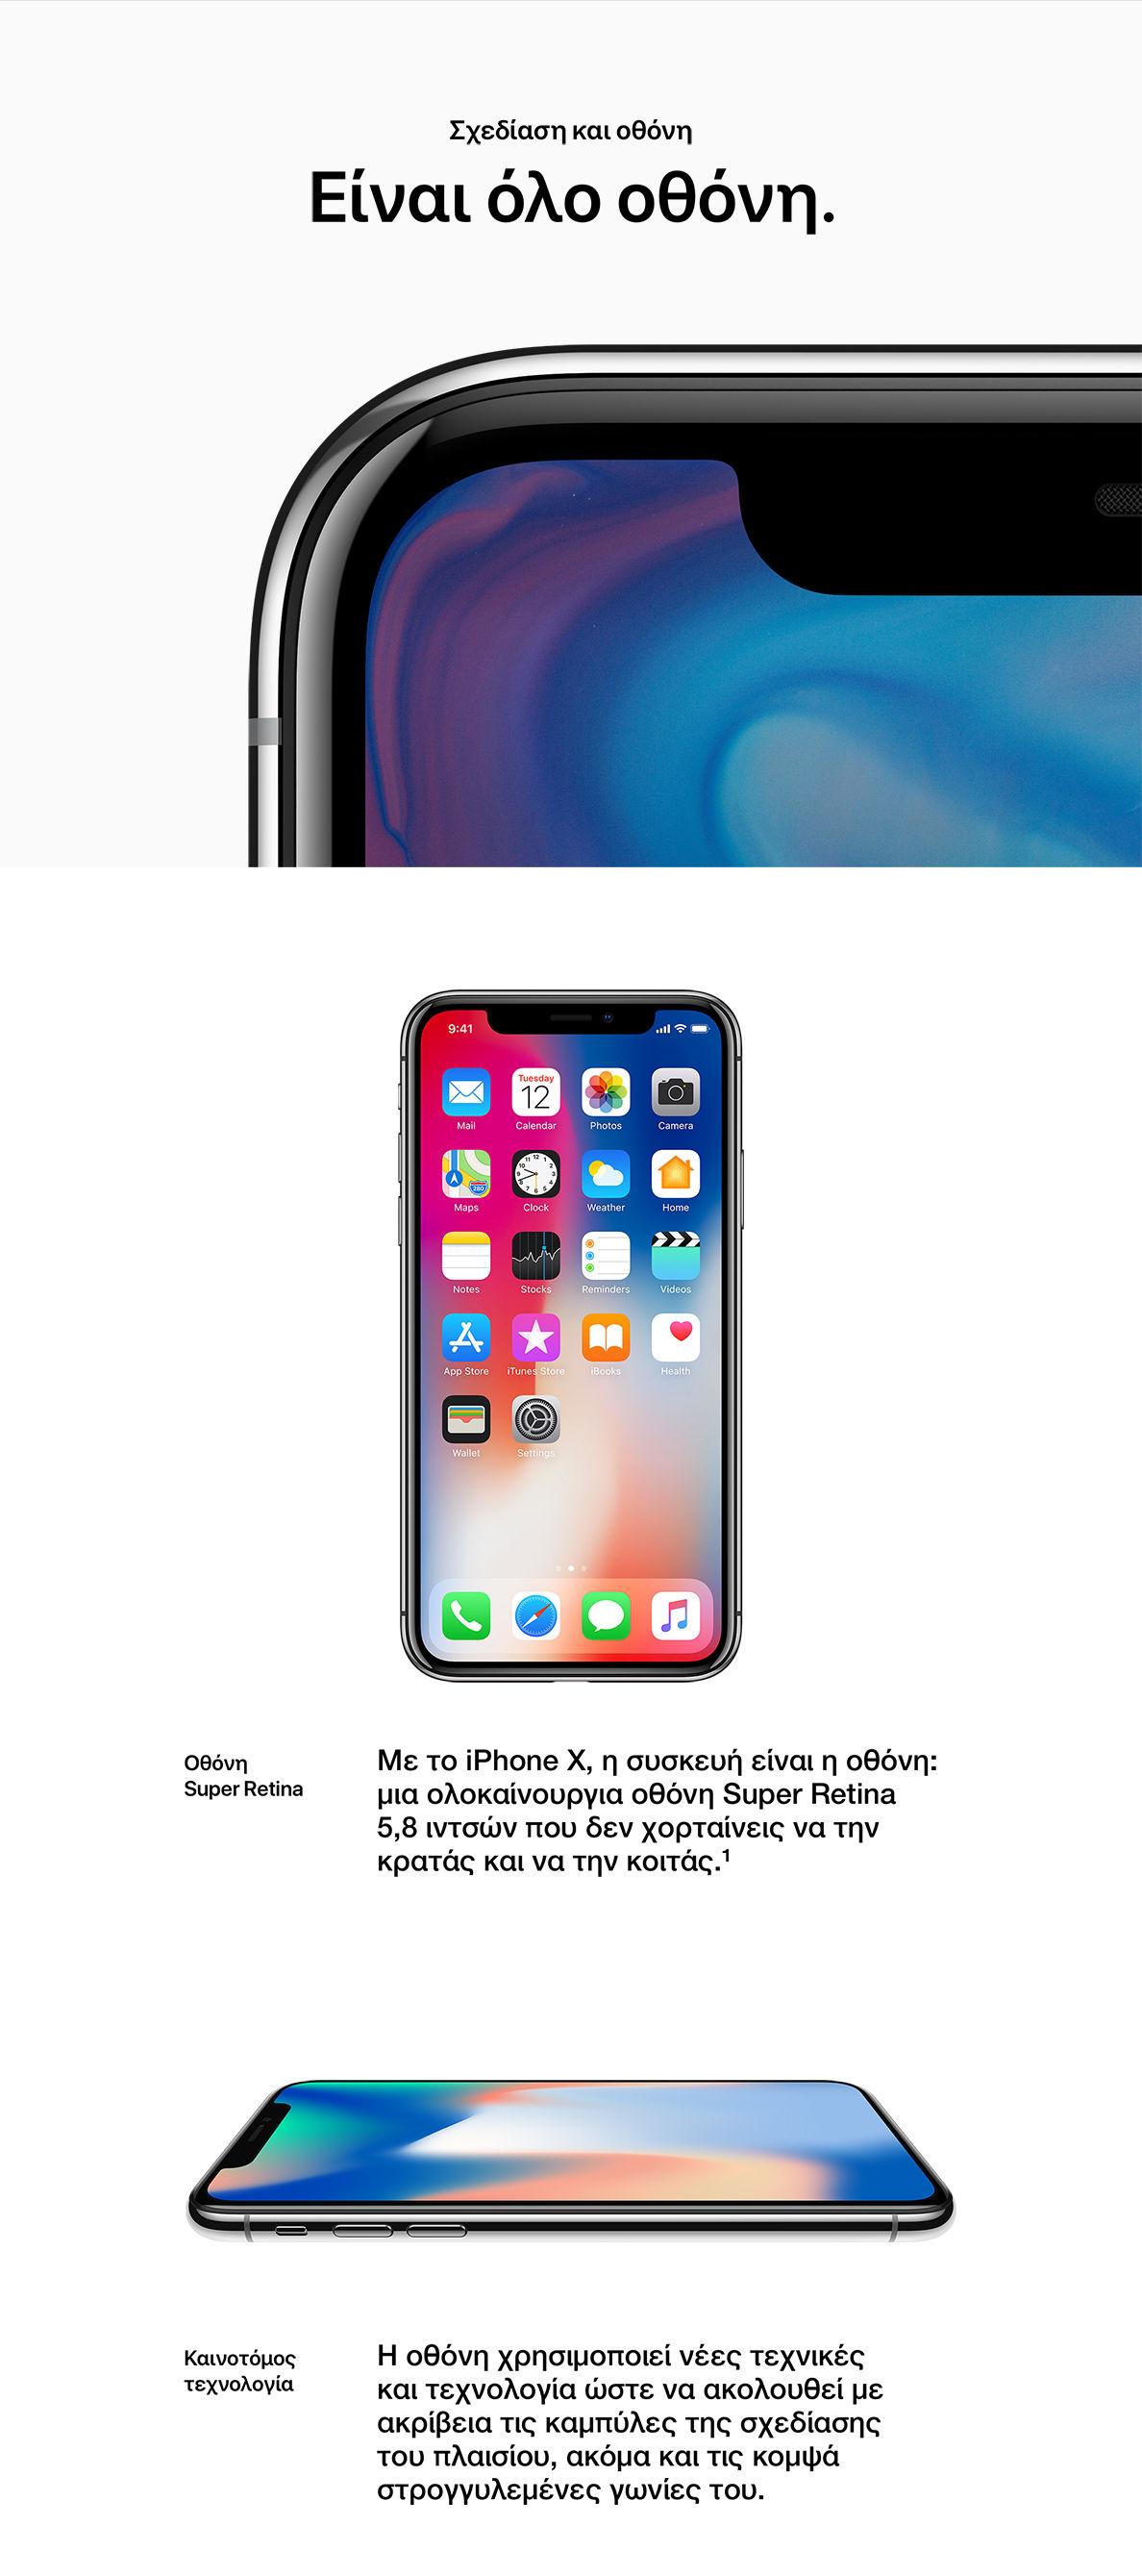 iPhonex-agora-Ellada-Mediamarkt-public-kotsovolos-germanos-iPhoneX-diathesimo-gia-paraggelia-november-2017 (1)